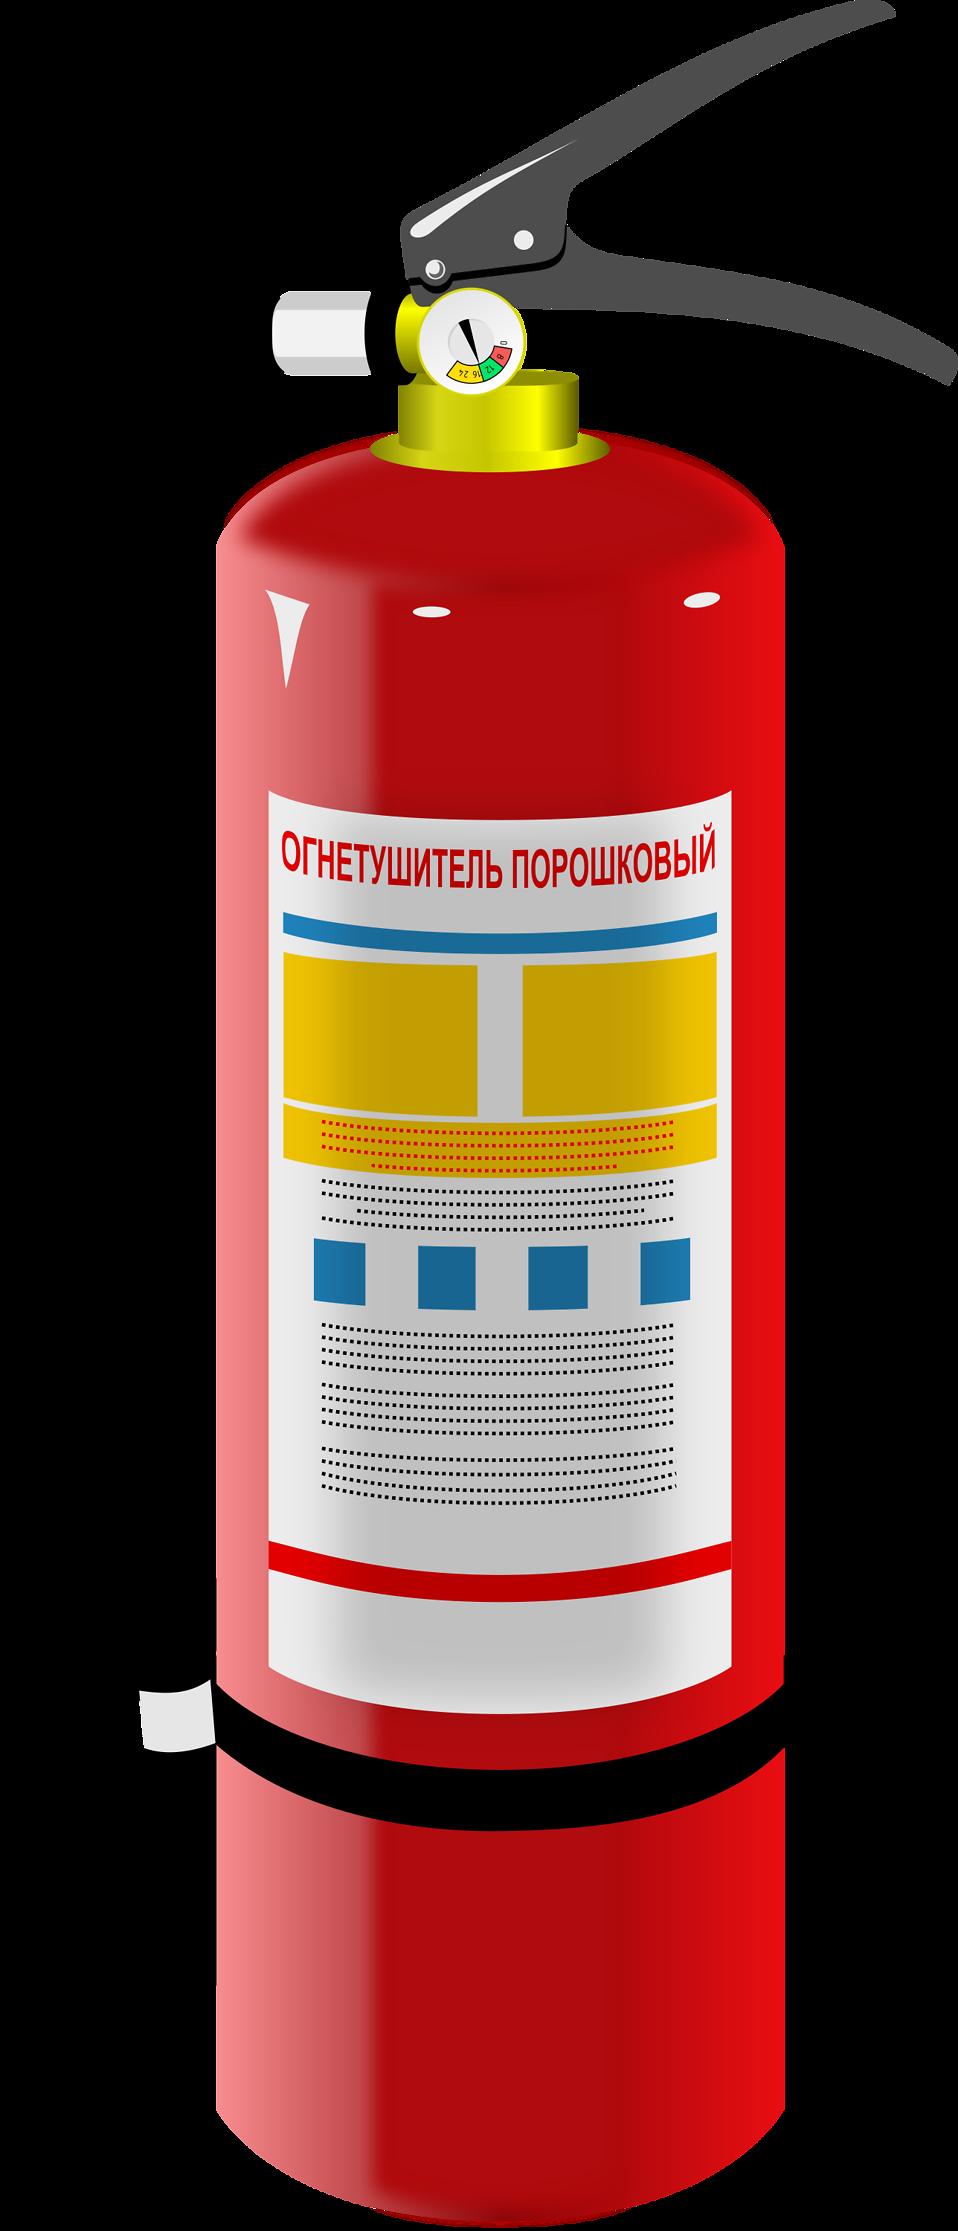 Flame clipart emoji. Fire extinguisher no background